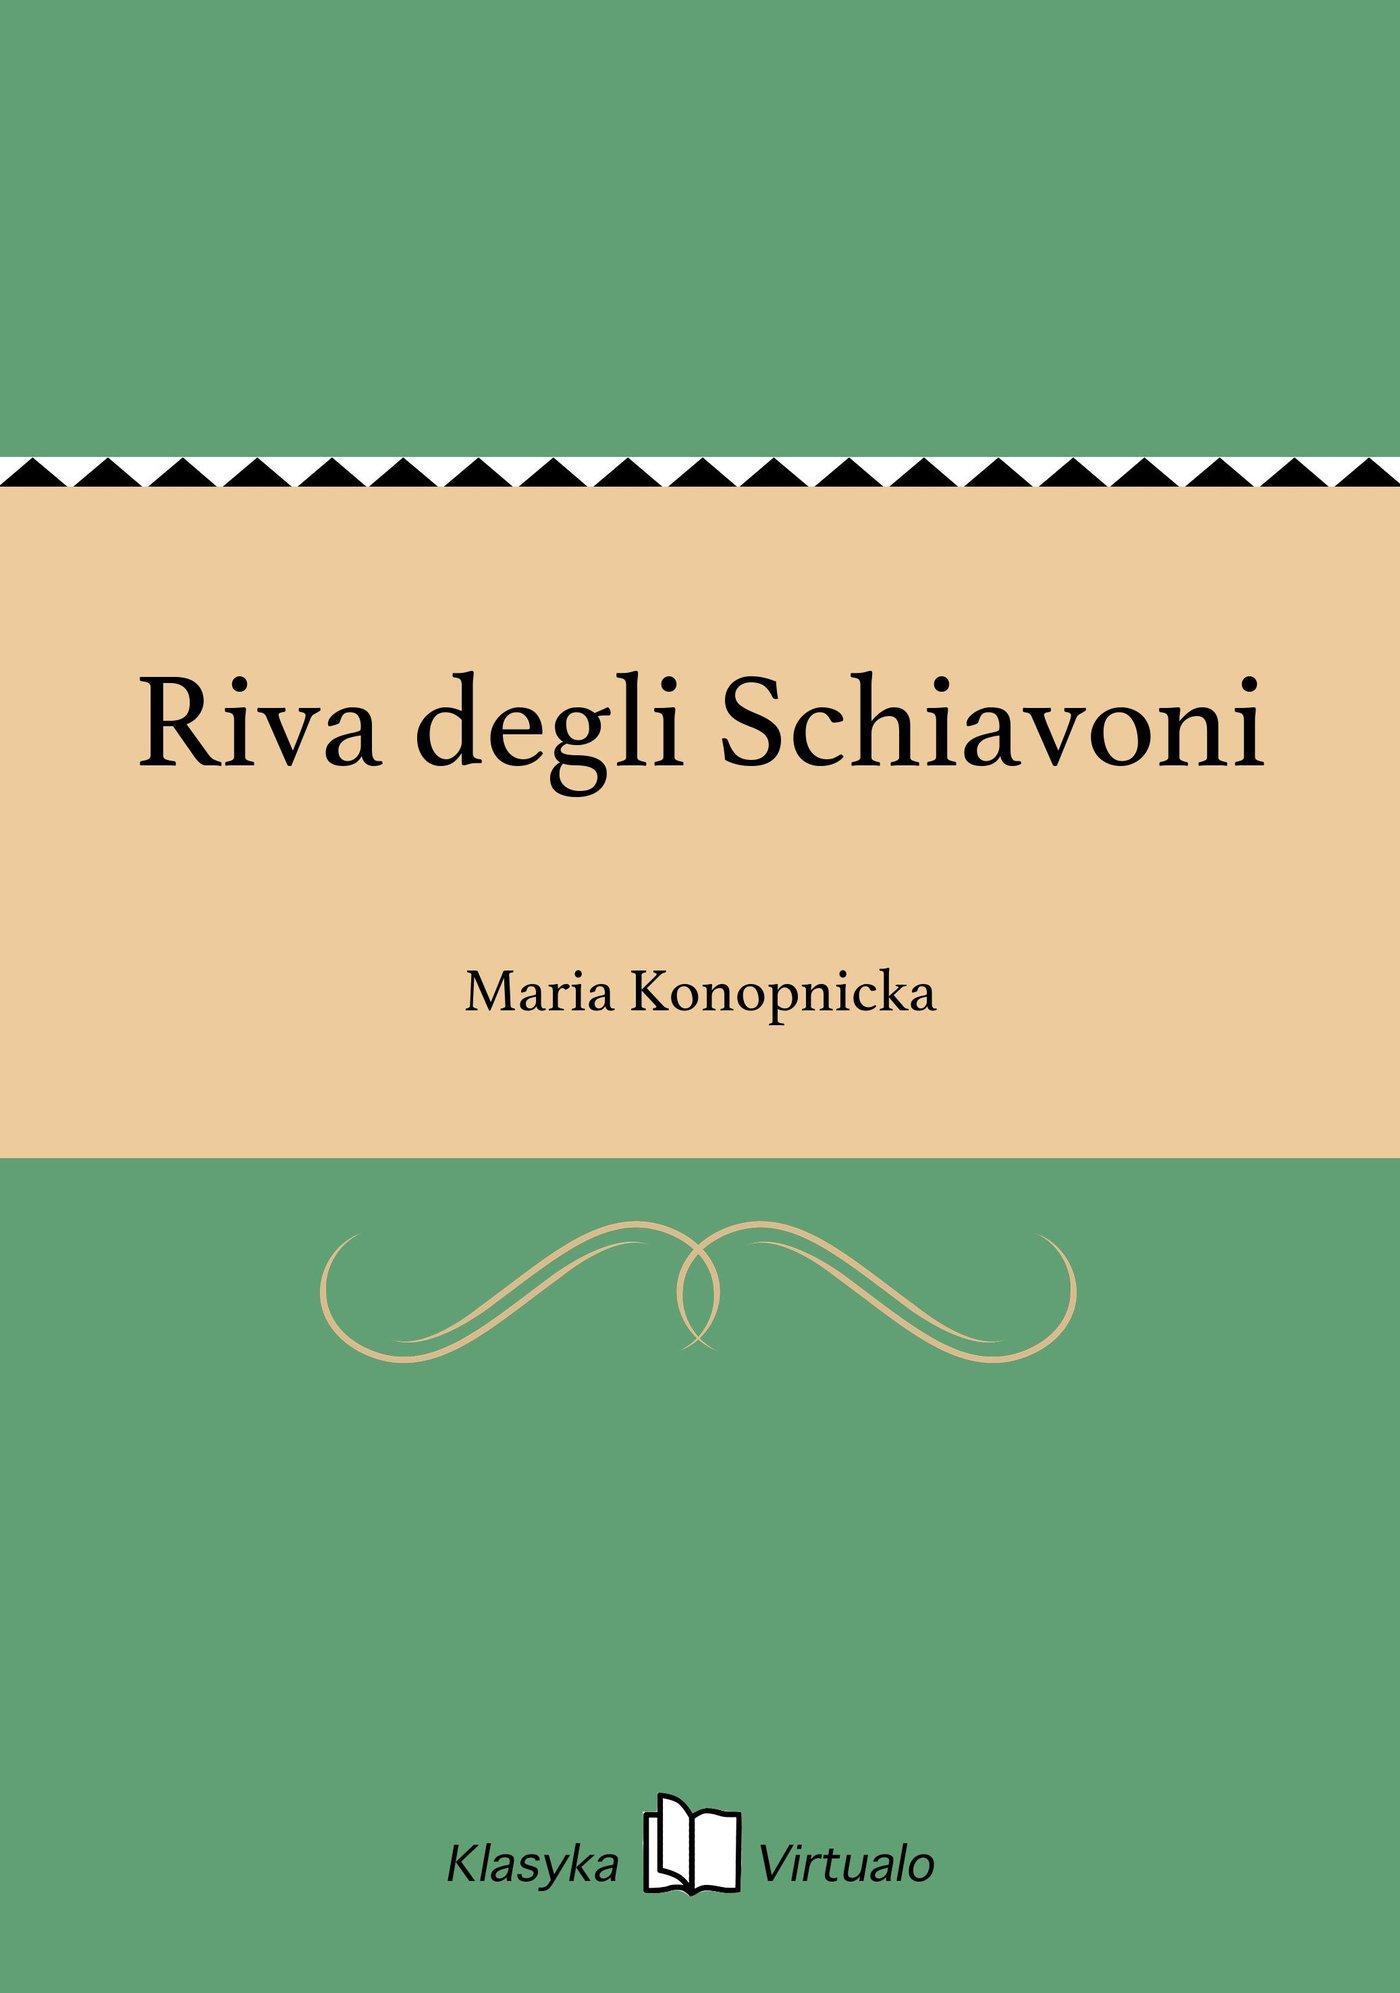 Riva degli Schiavoni - Ebook (Książka EPUB) do pobrania w formacie EPUB